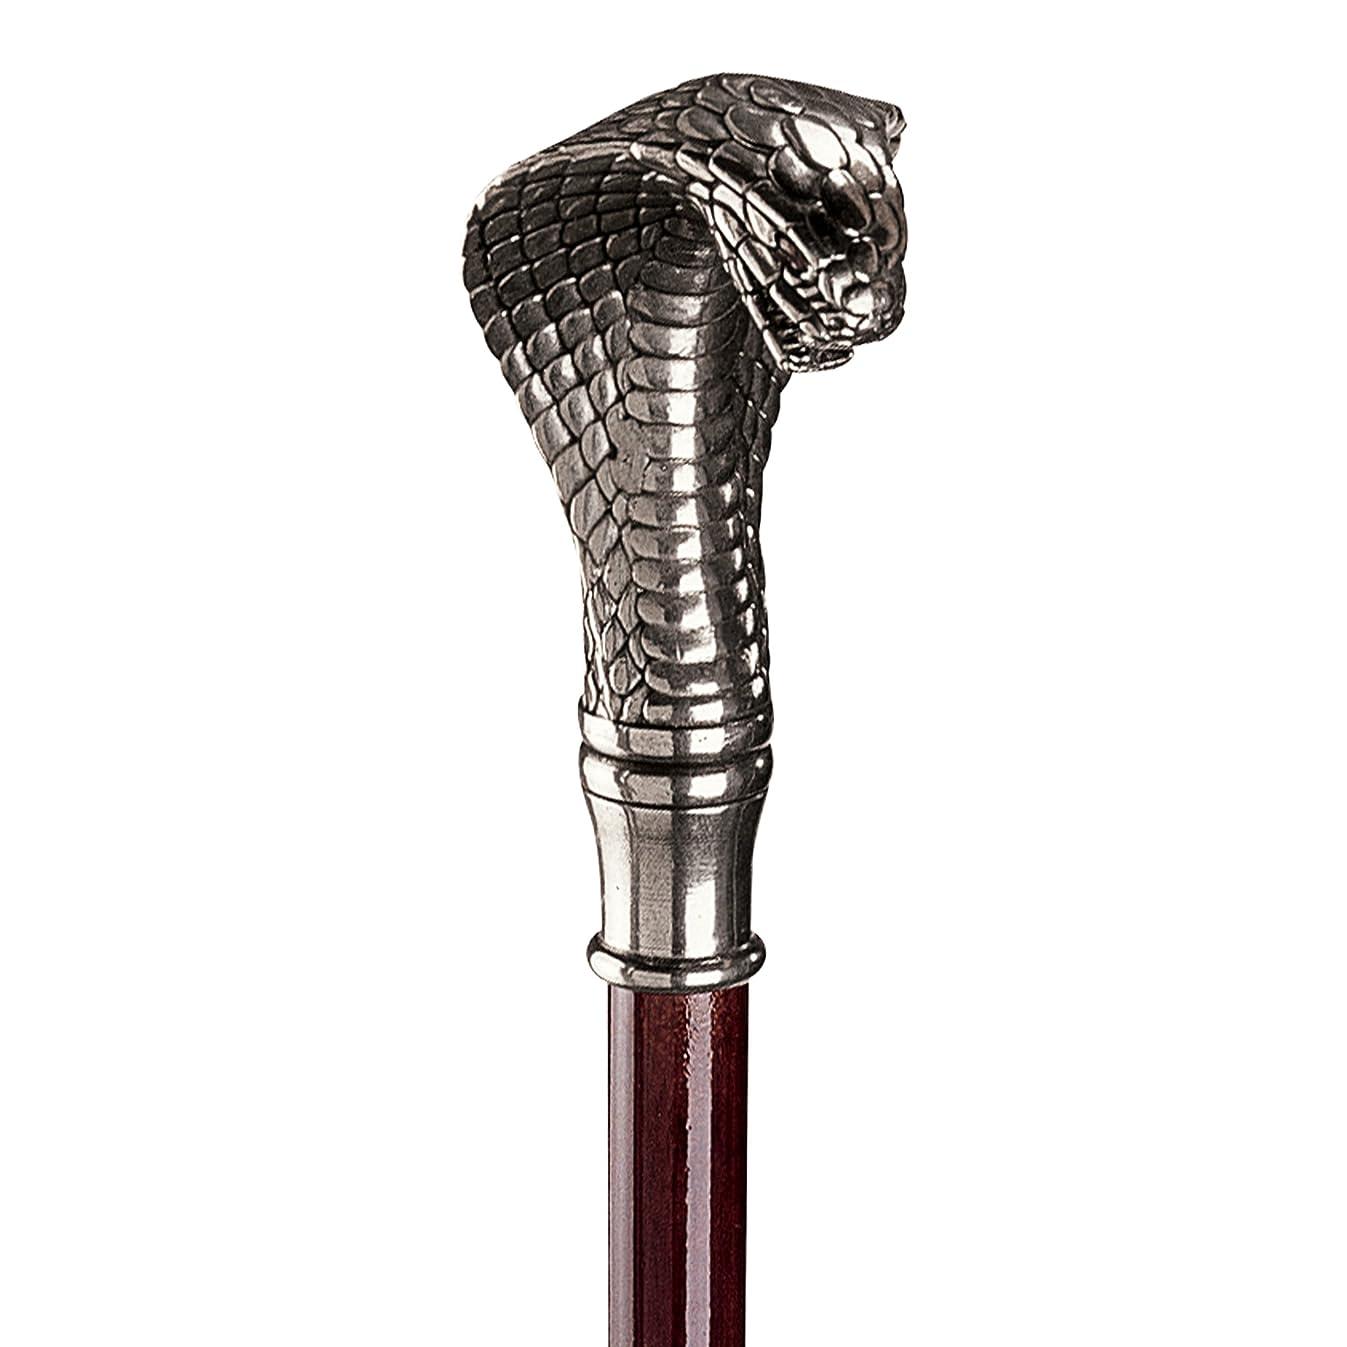 Design Toscano Cobra Walking Stick, 35 Inch, Pewter Handle and Hardwood Cane, Silver